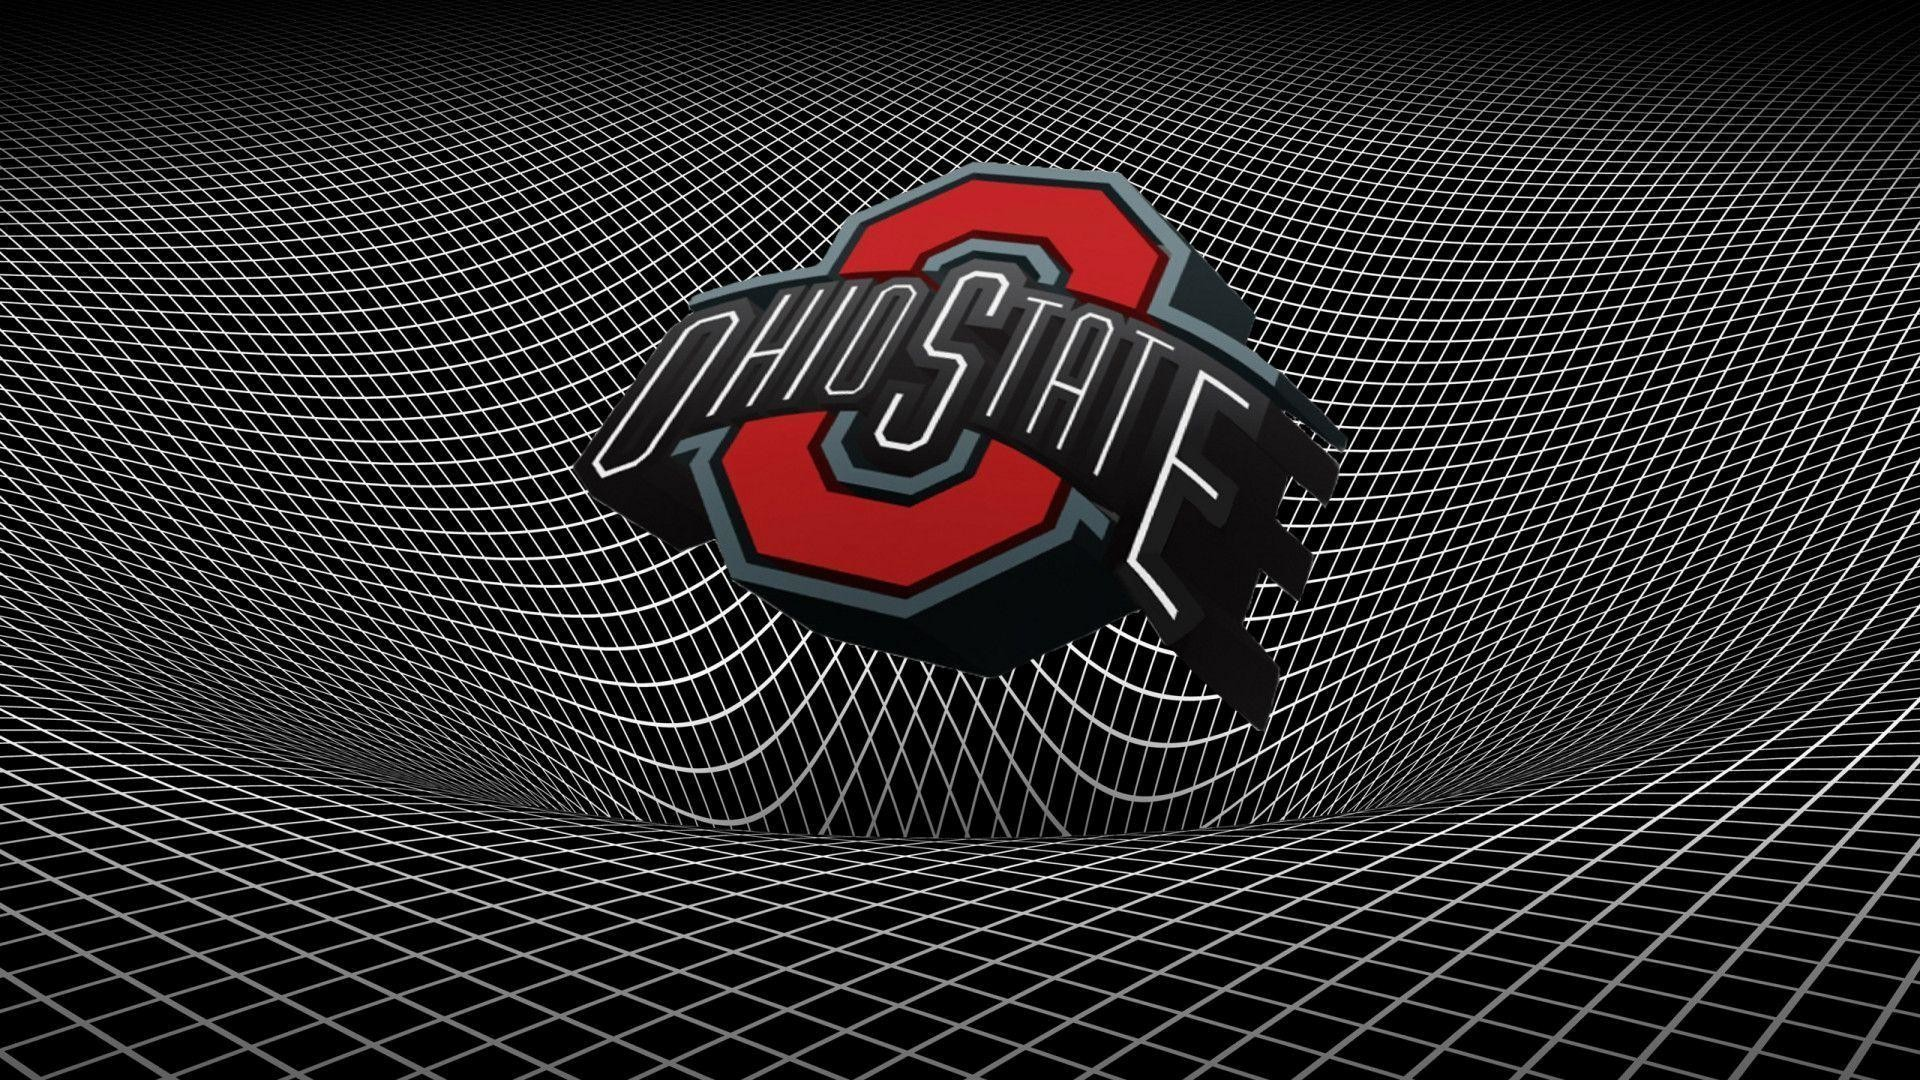 wallpaper.wiki-Ohio-State-Buckeyes-Football-Wallpaper-PIC-